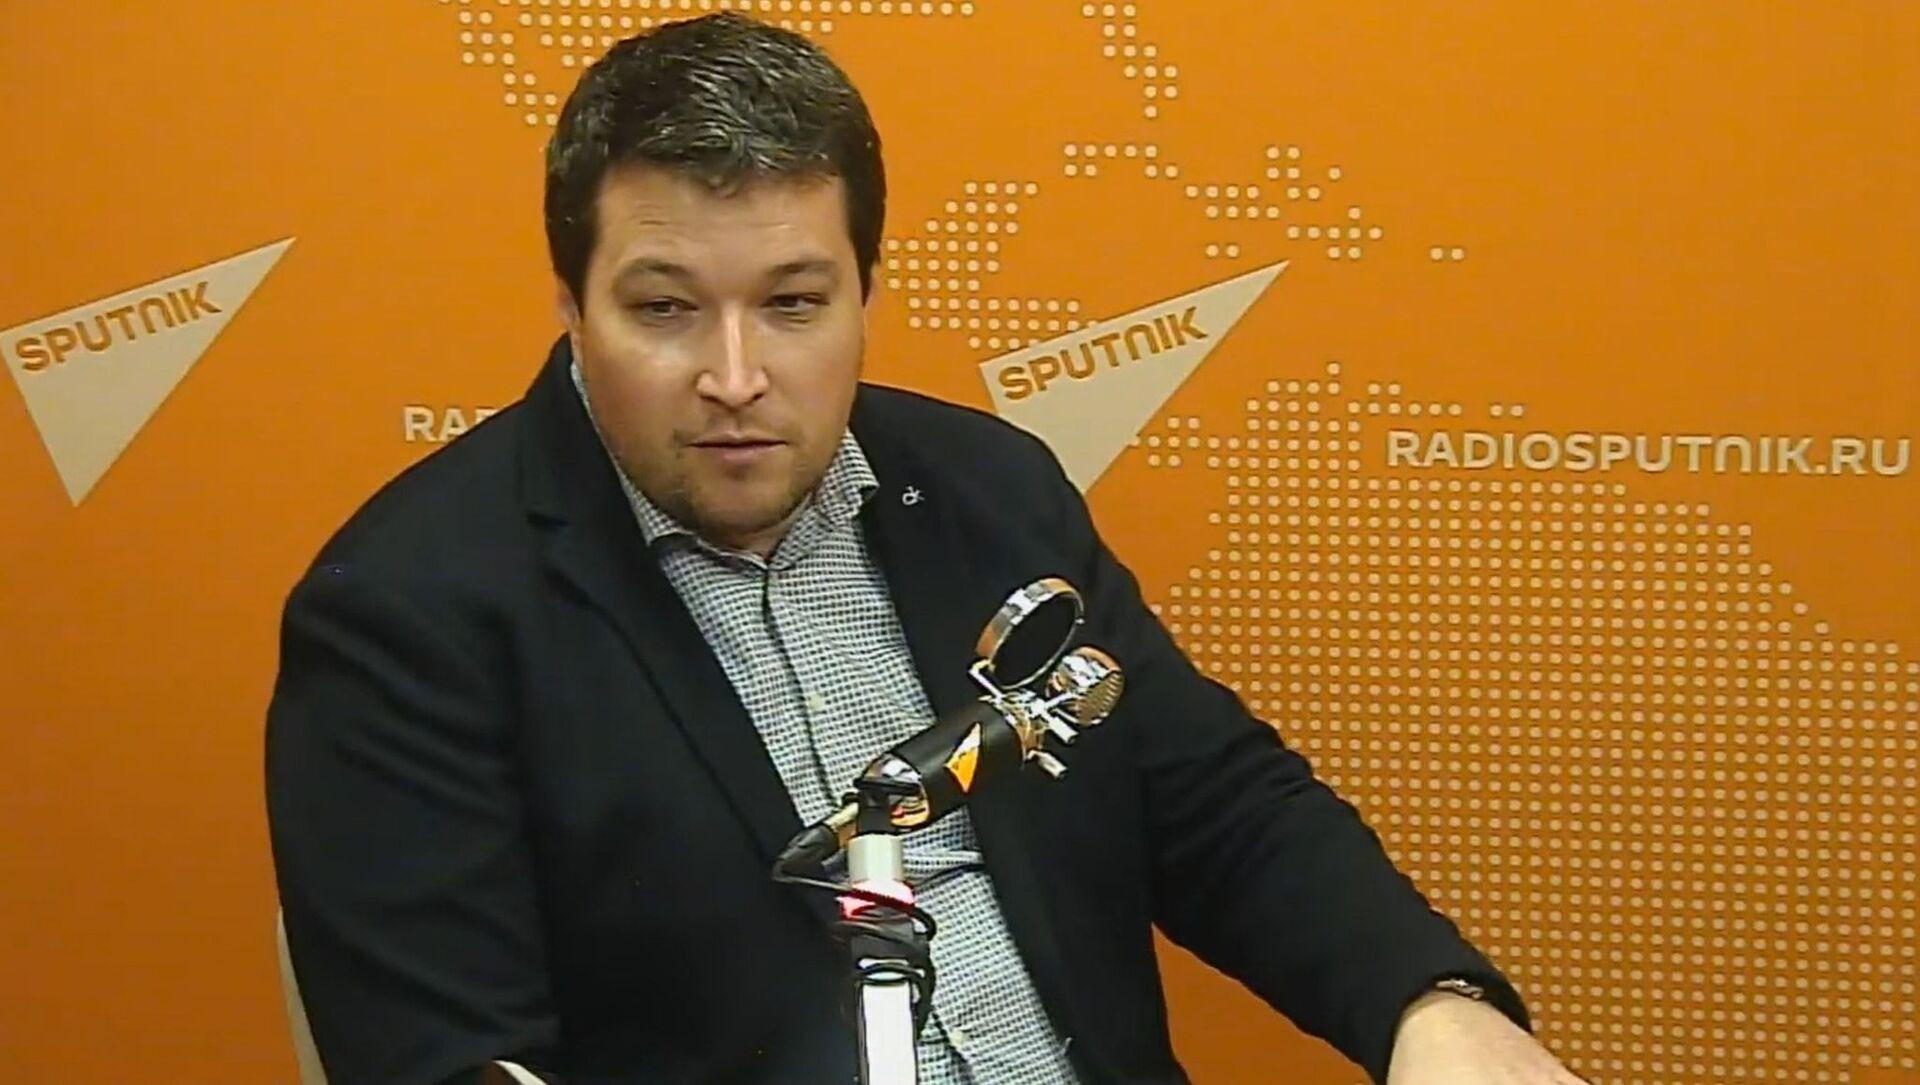 Кандидат медицинских наук, врач-иммунолог Николай Крючков - Sputnik Беларусь, 1920, 04.02.2021